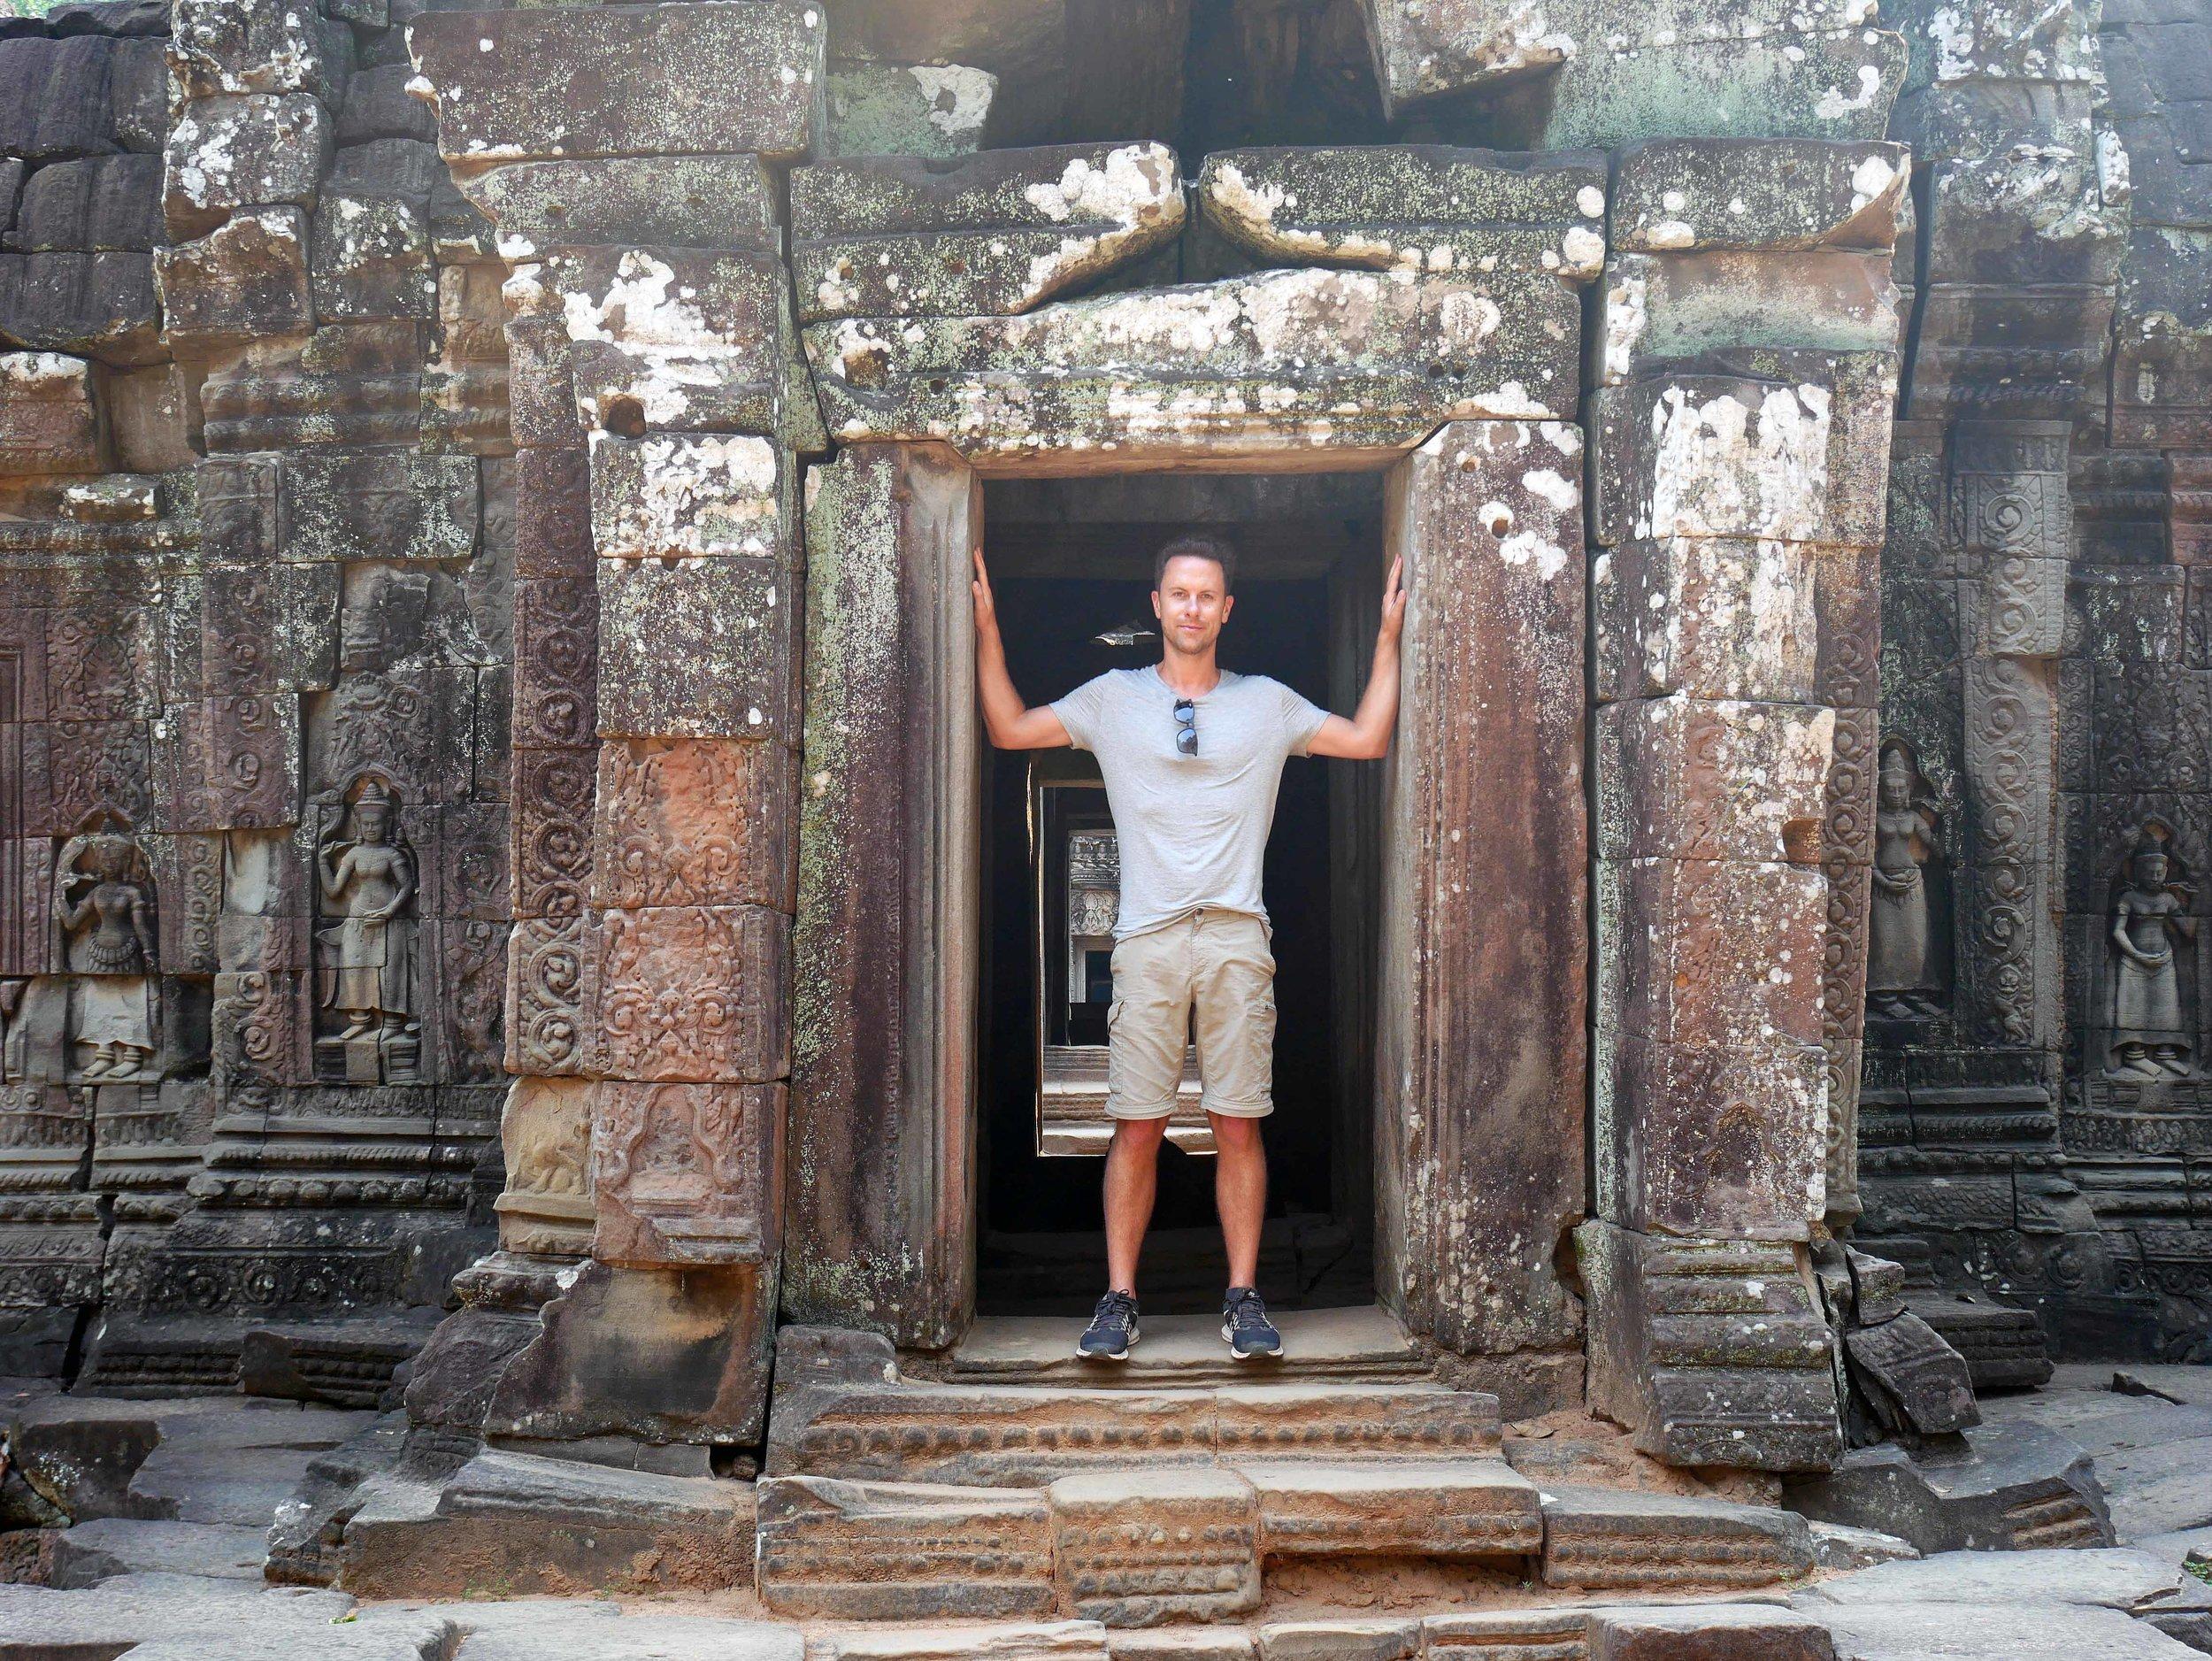 Martin taking in the crumbling ruins of Ta Som (Feb 27).